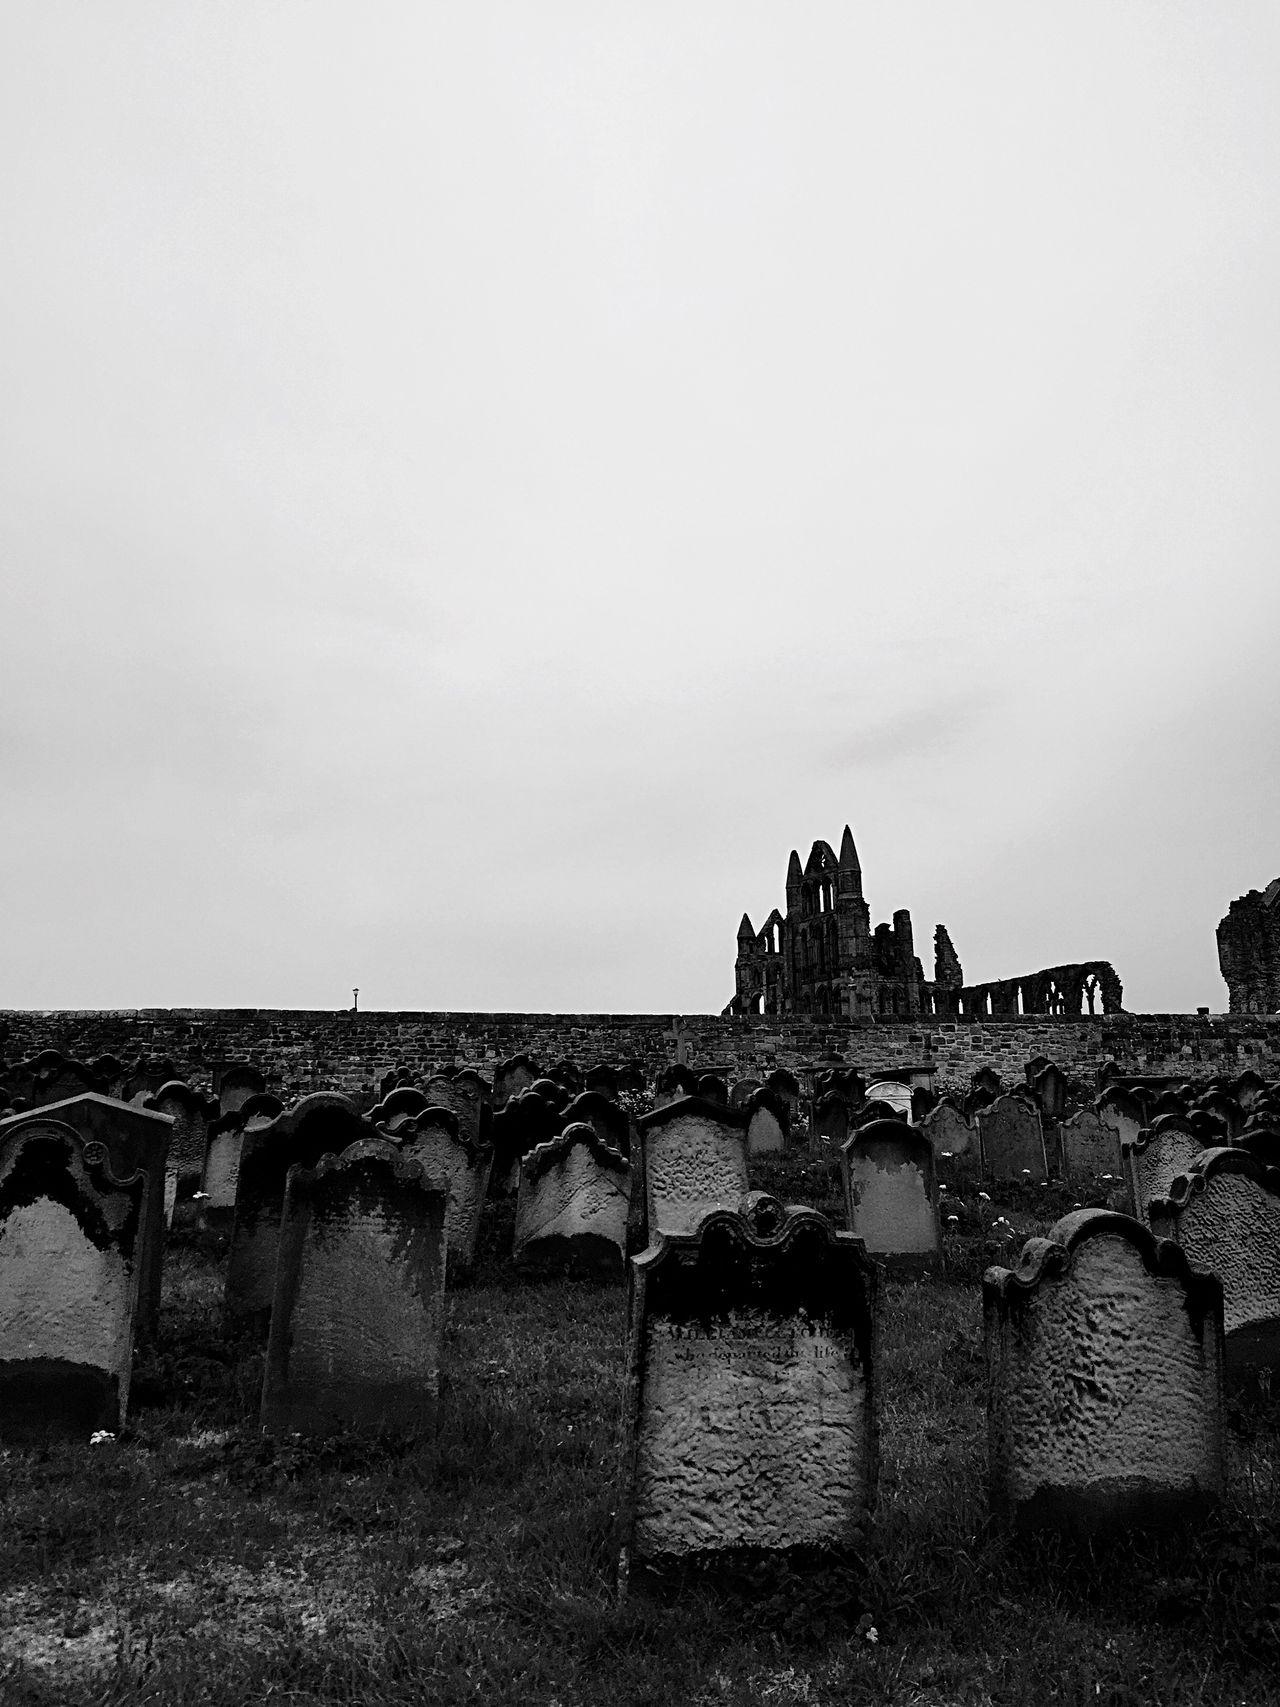 Dracula From Where I Stand Blackandwhite Photography Whitby Black & White Churchyard Headstones Whitbyabbey